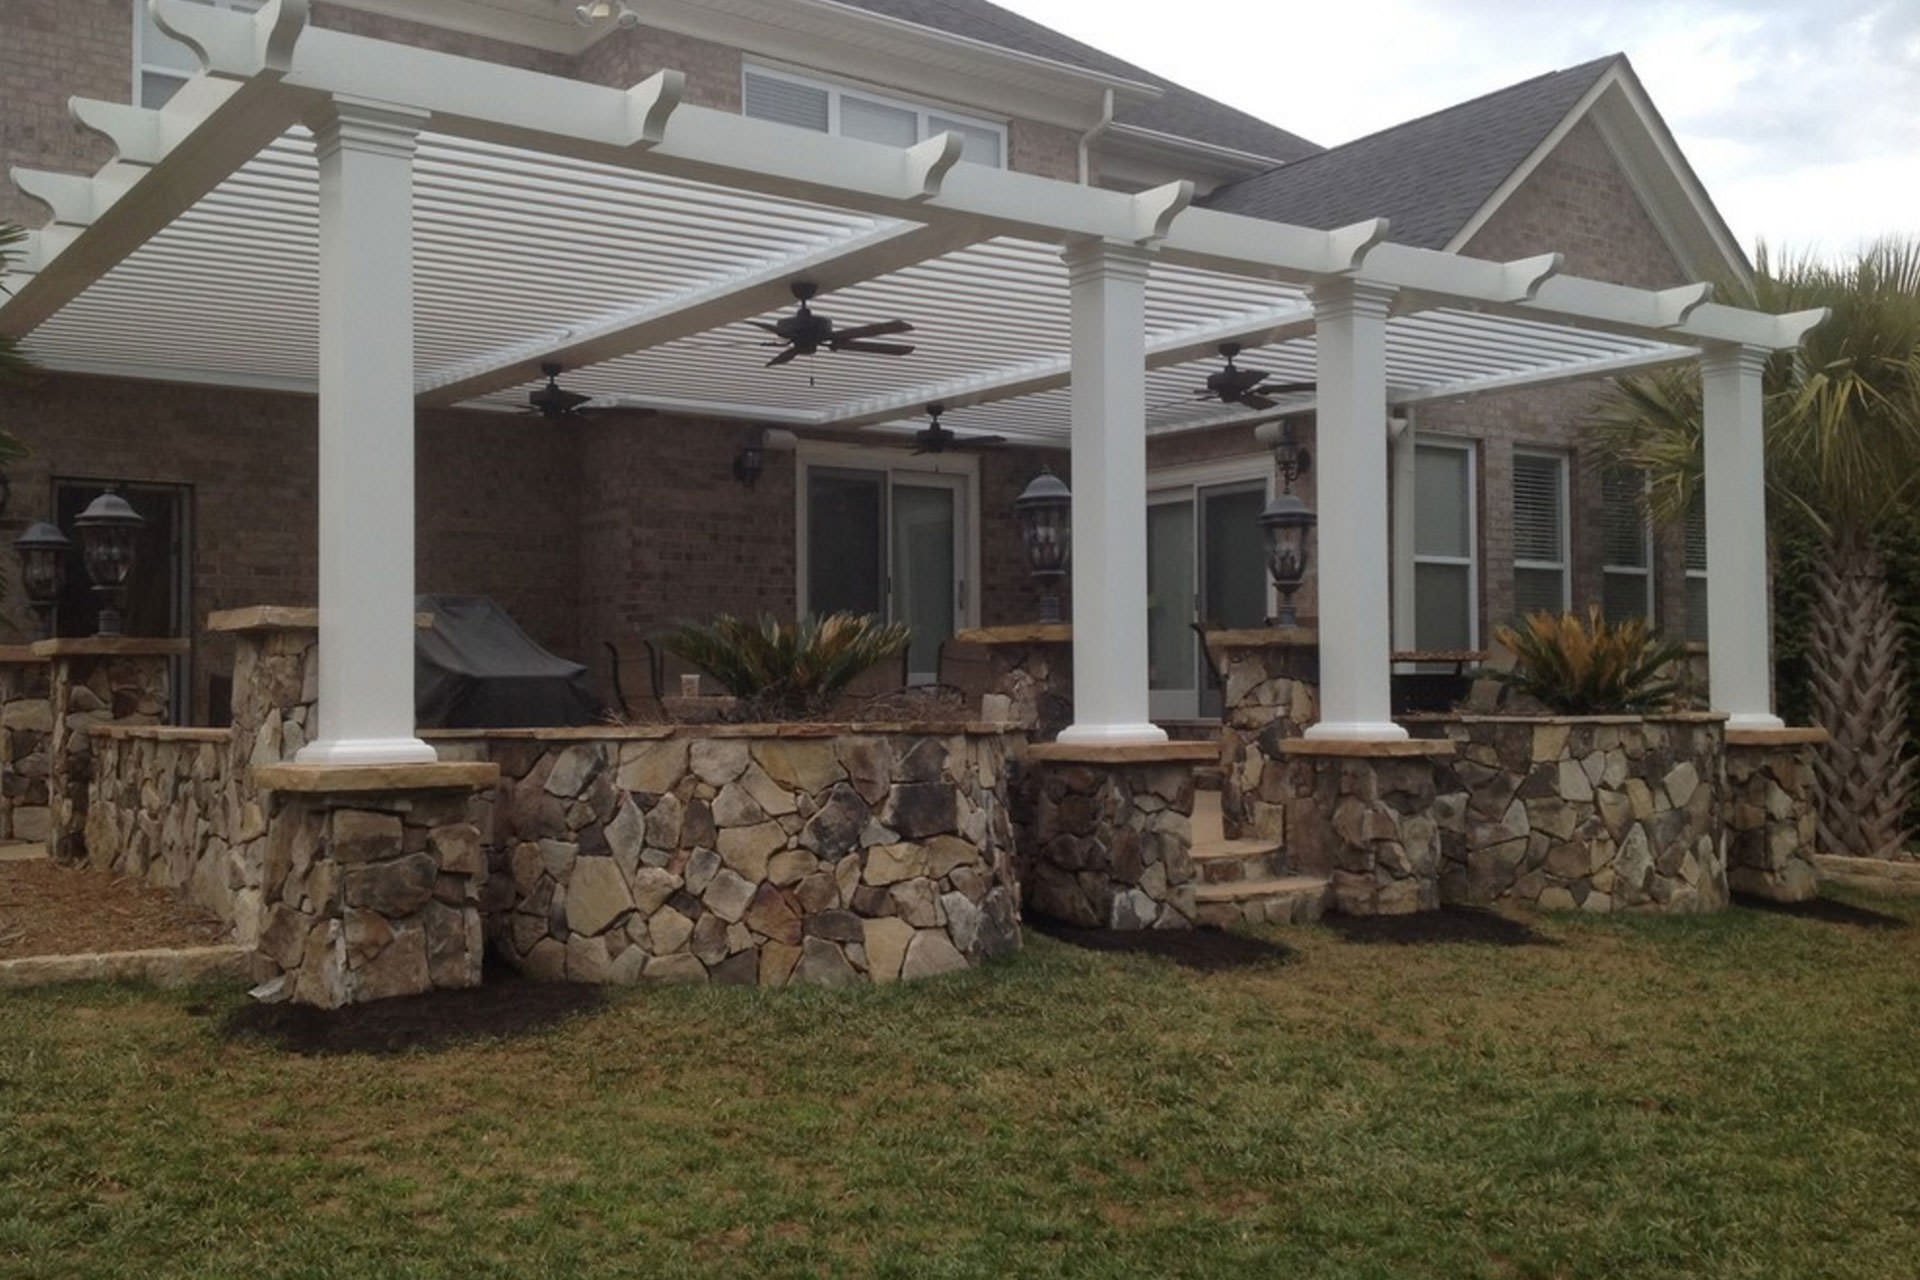 Retractable Roof Pergola Home Design Inside